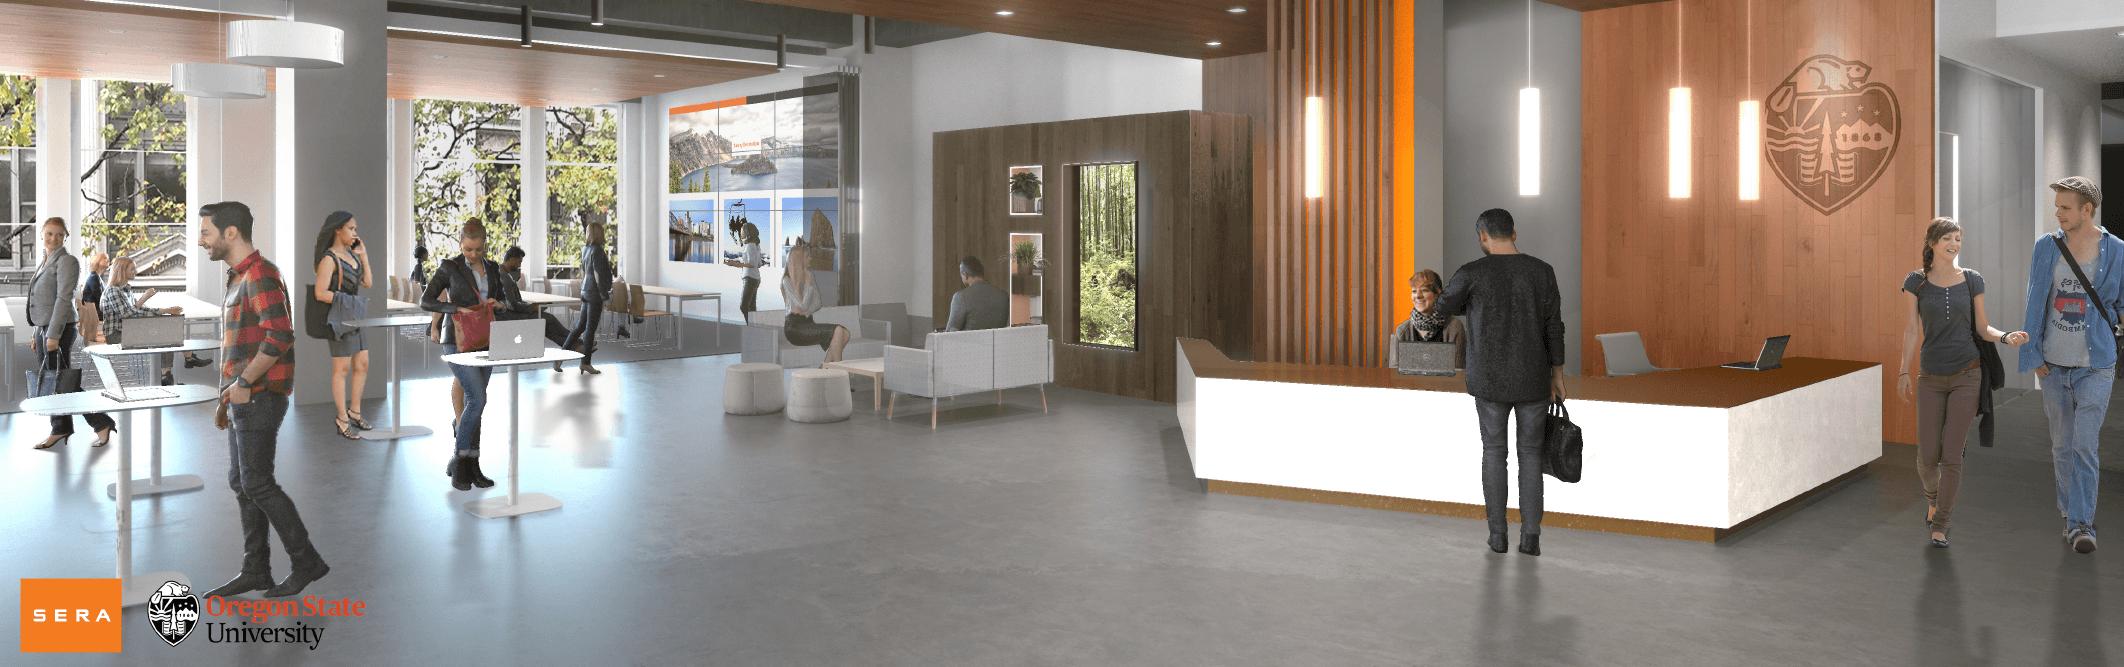 OSU Portland Center lobby rendering(cropped)